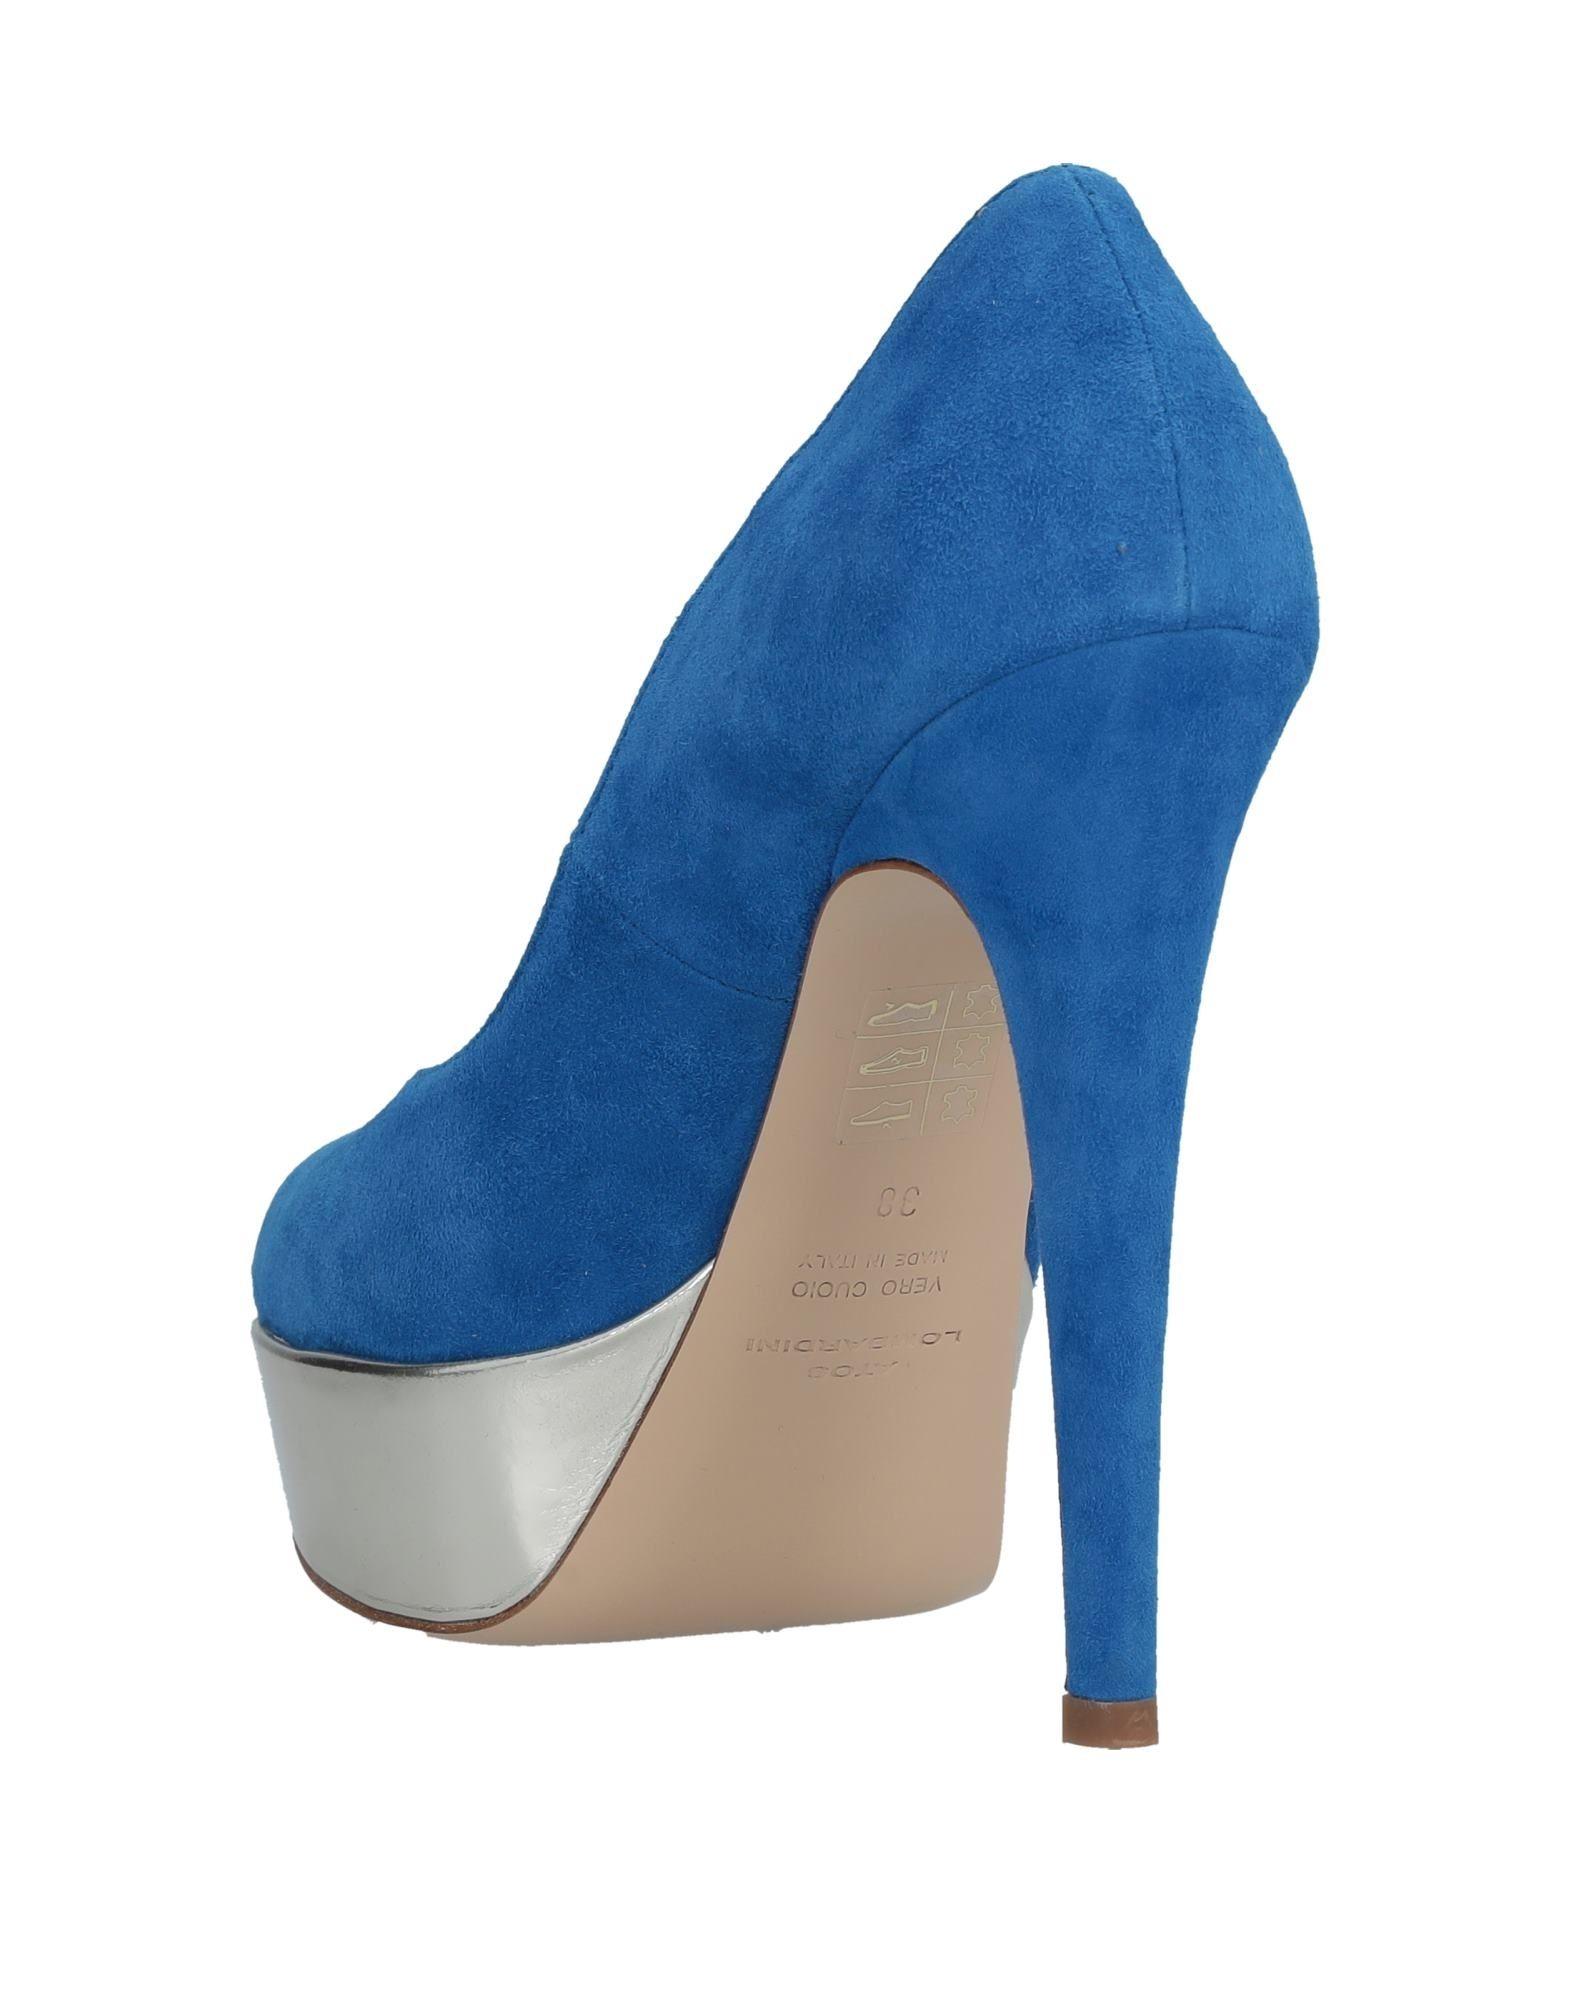 Atos Lombardini Pumps Damen strapazierfähige  11533572HVGut aussehende strapazierfähige Damen Schuhe fe98fd